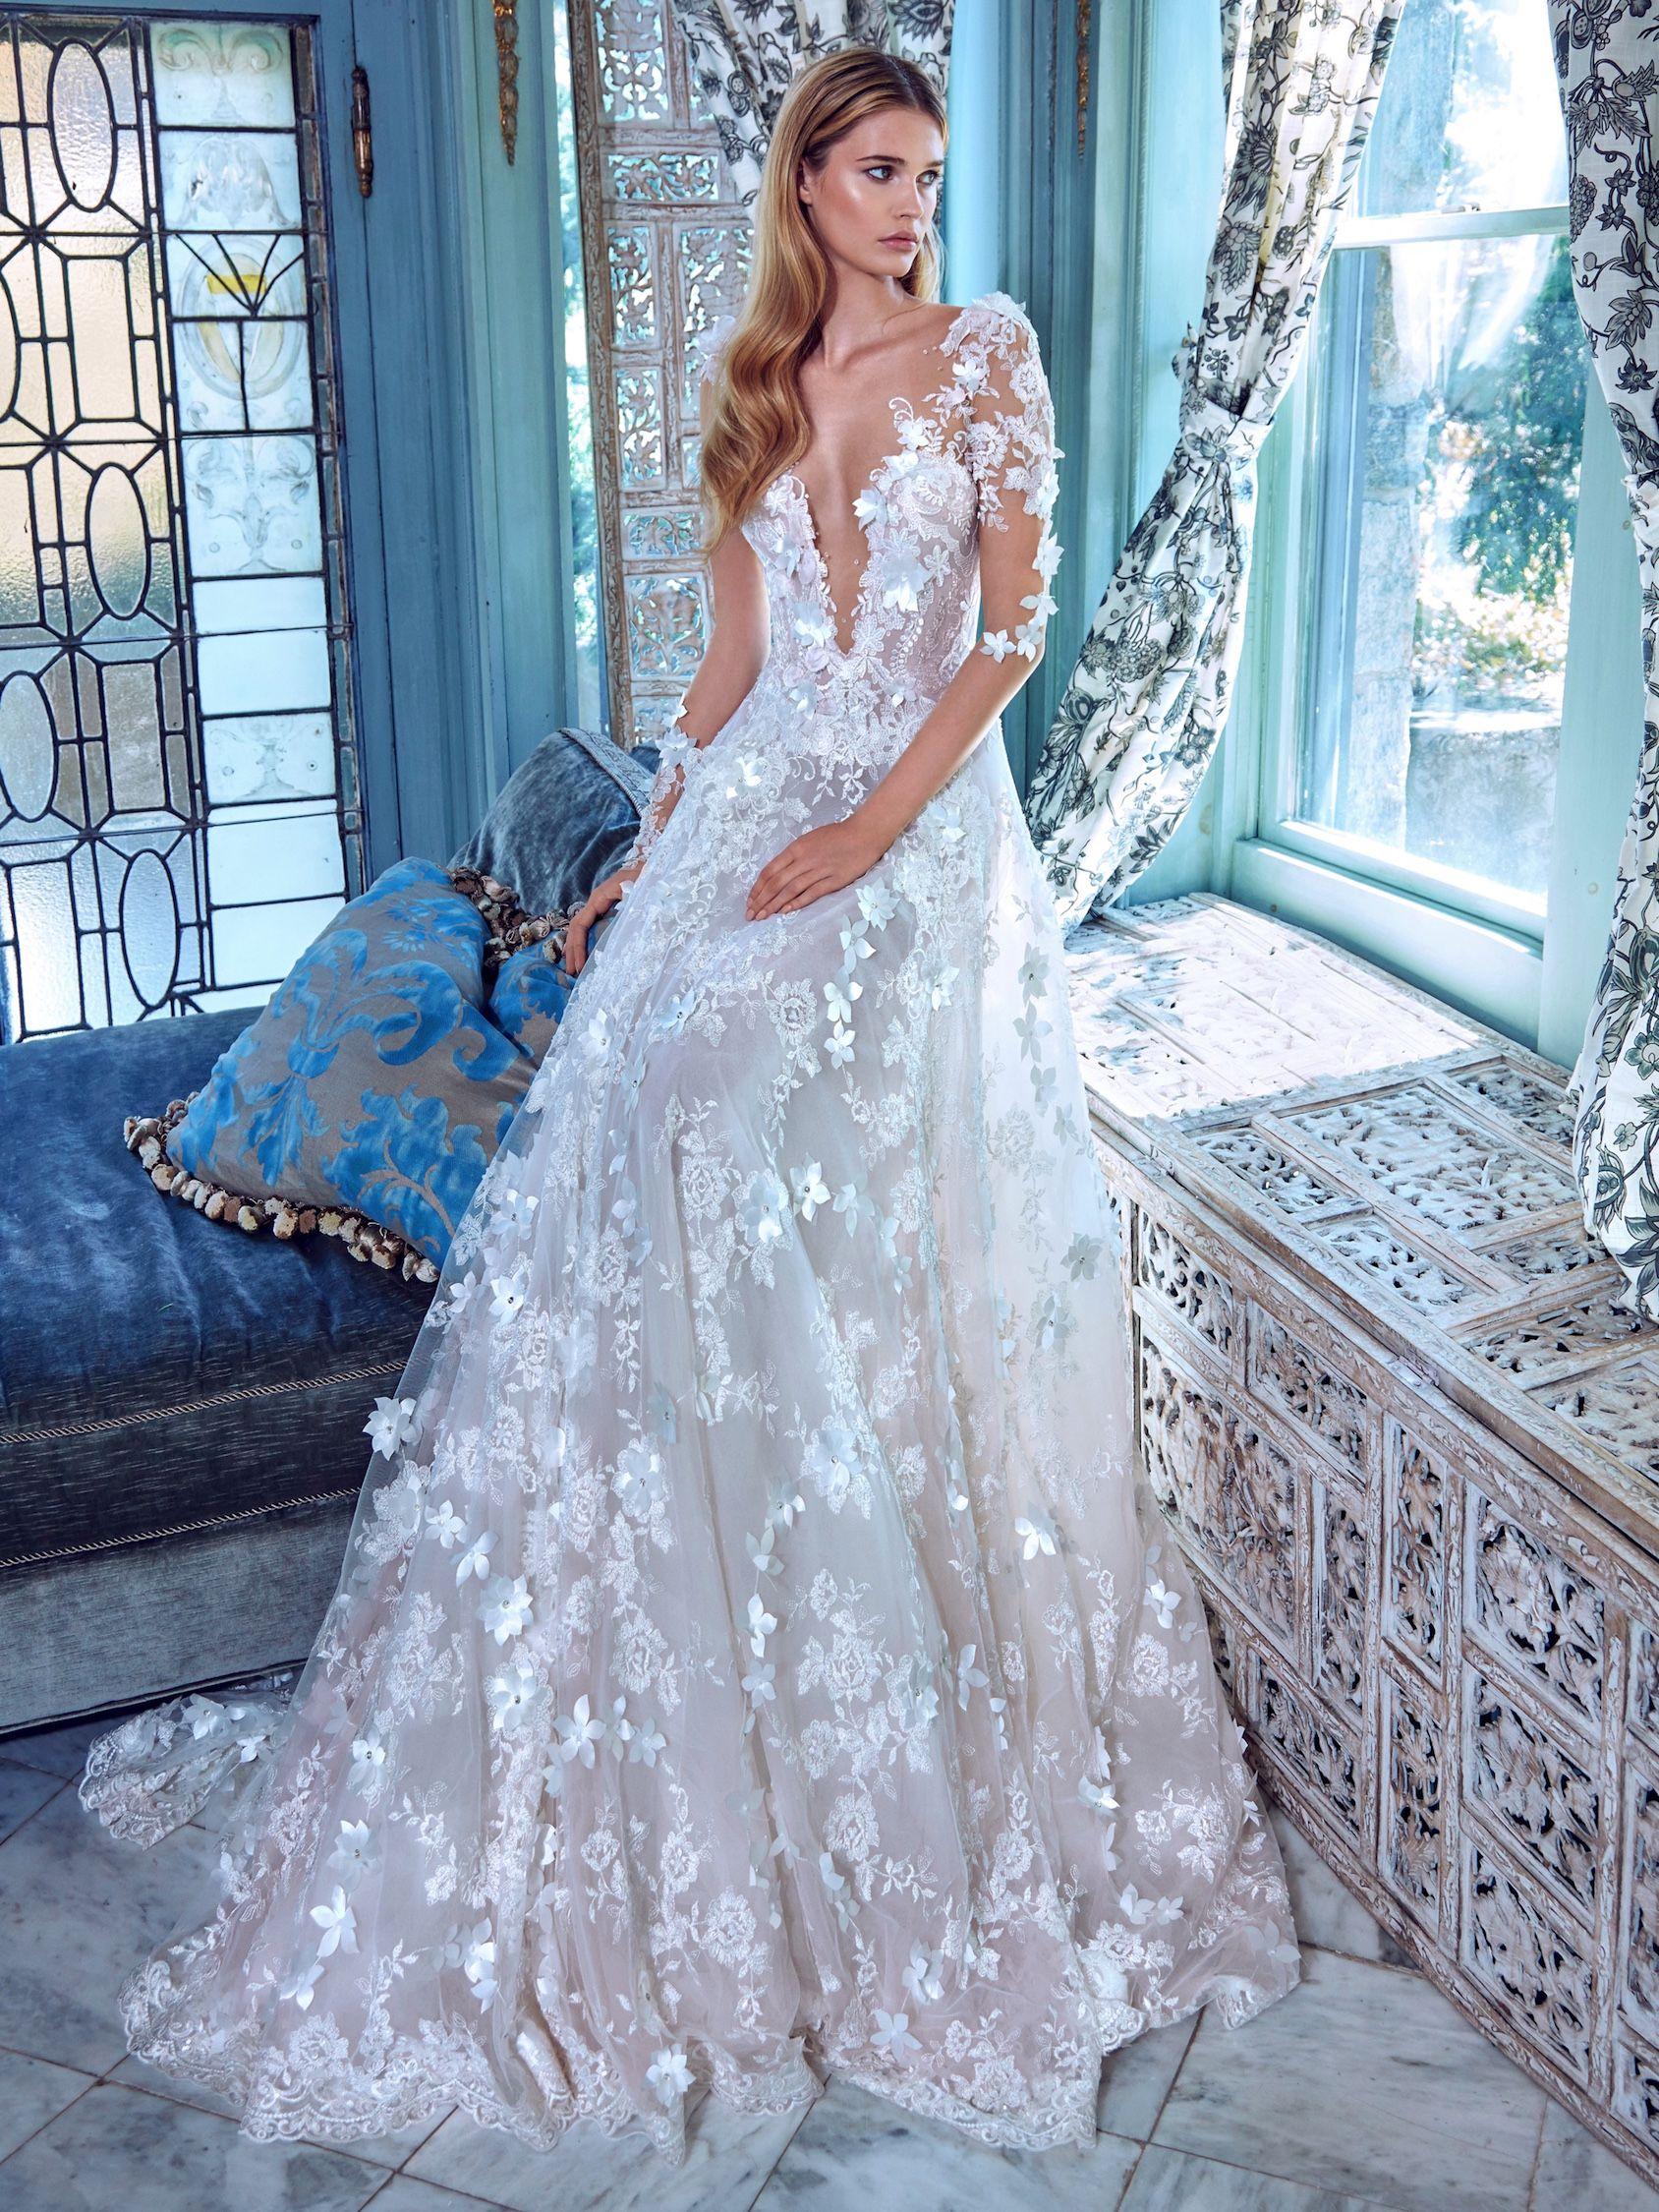 Arabella | My Favorite Wedding Gowns | Pinterest | De novia, Novios ...